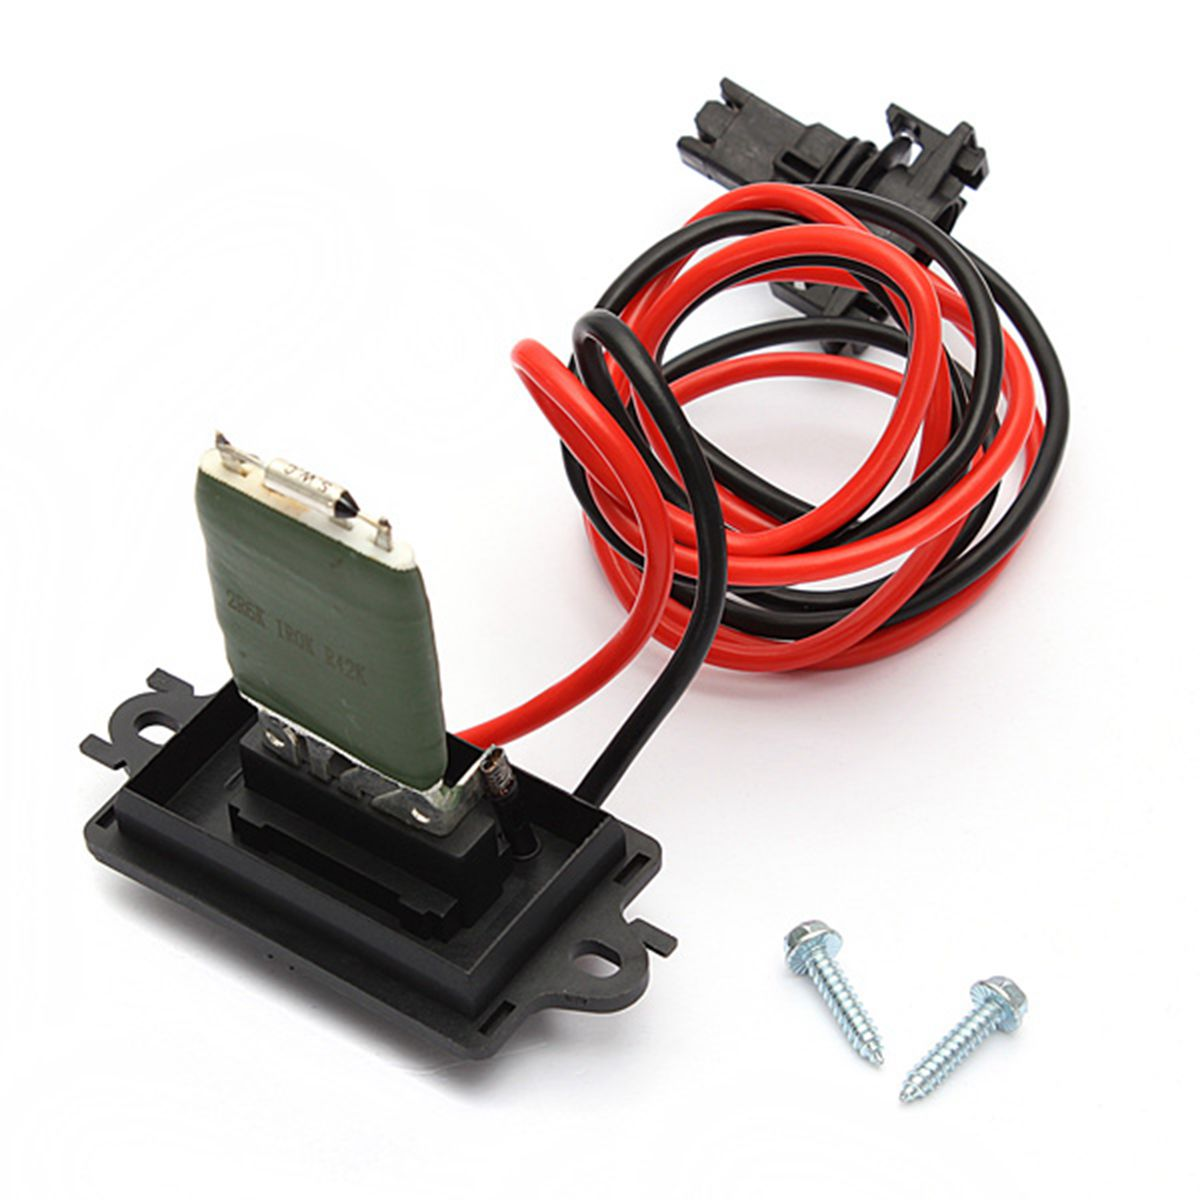 Sensible Car Heater Motor Fan Blower Resistor For Renault/grand/scenic/mk Ii Iii 2003-2014 Fashionable(In) Style;